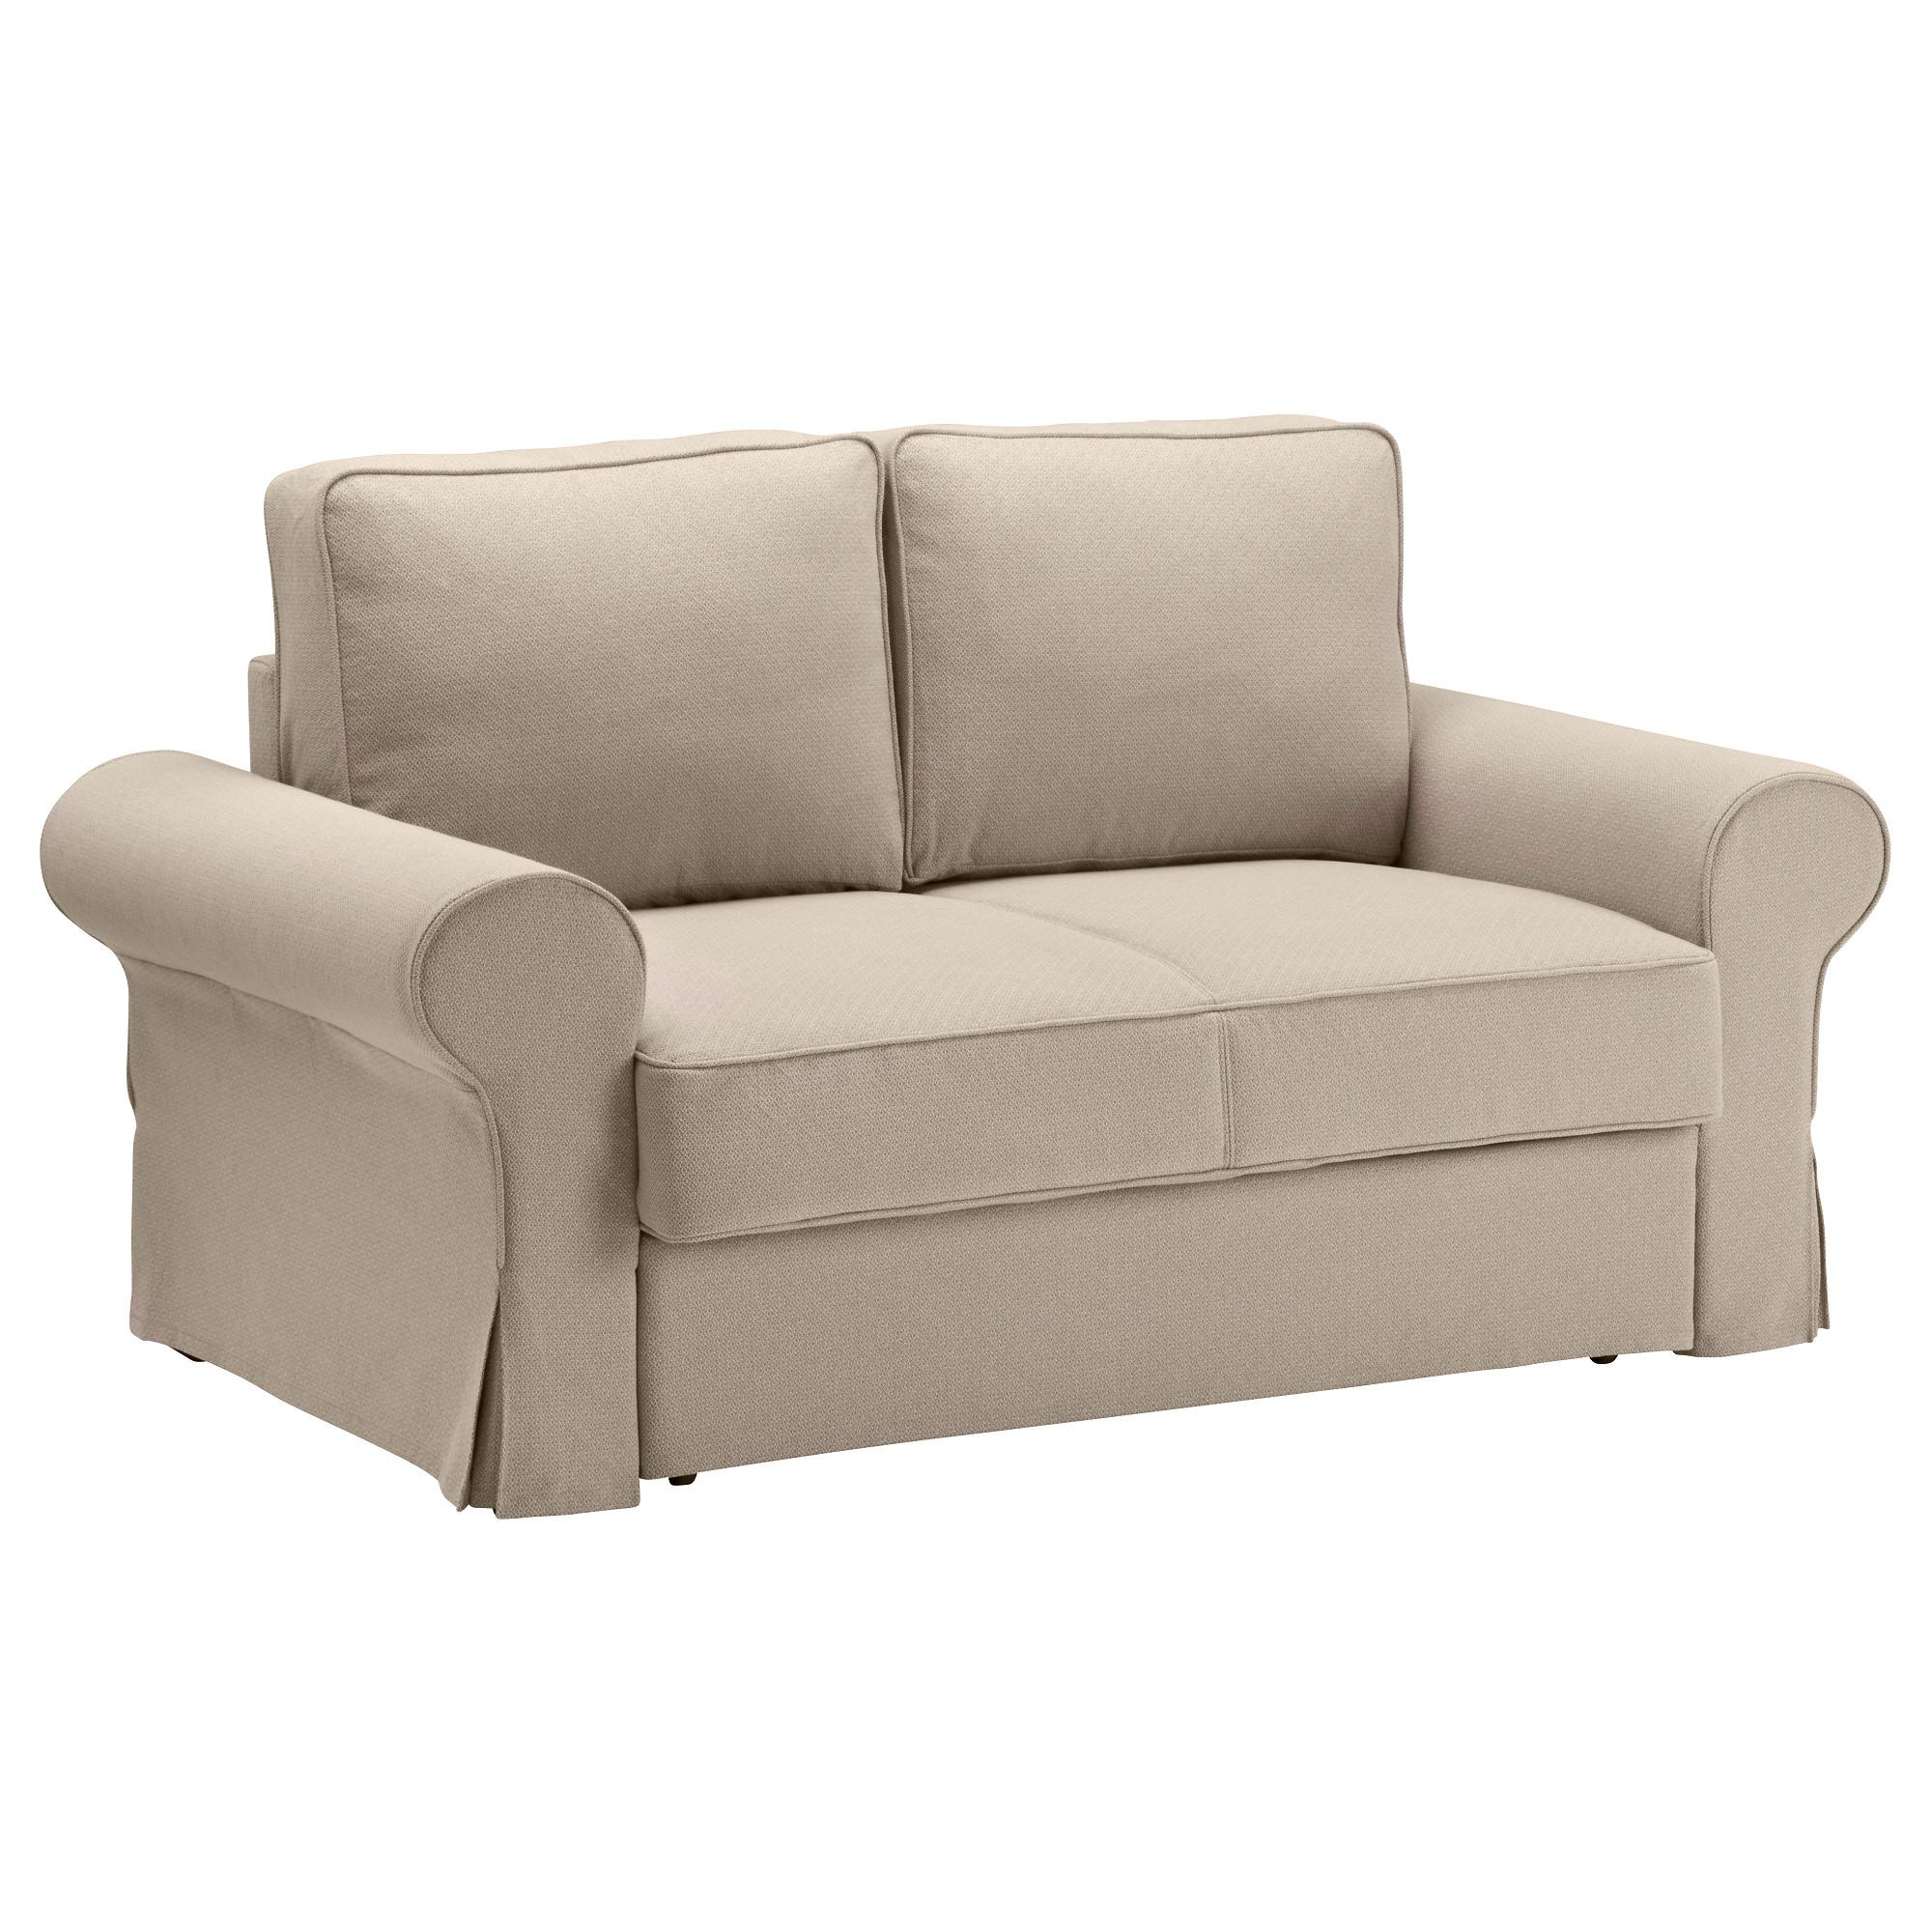 Ikea sofas Cama Ipdd Backabro sofà Cama 2 Plazas Hylte Beige Ikea